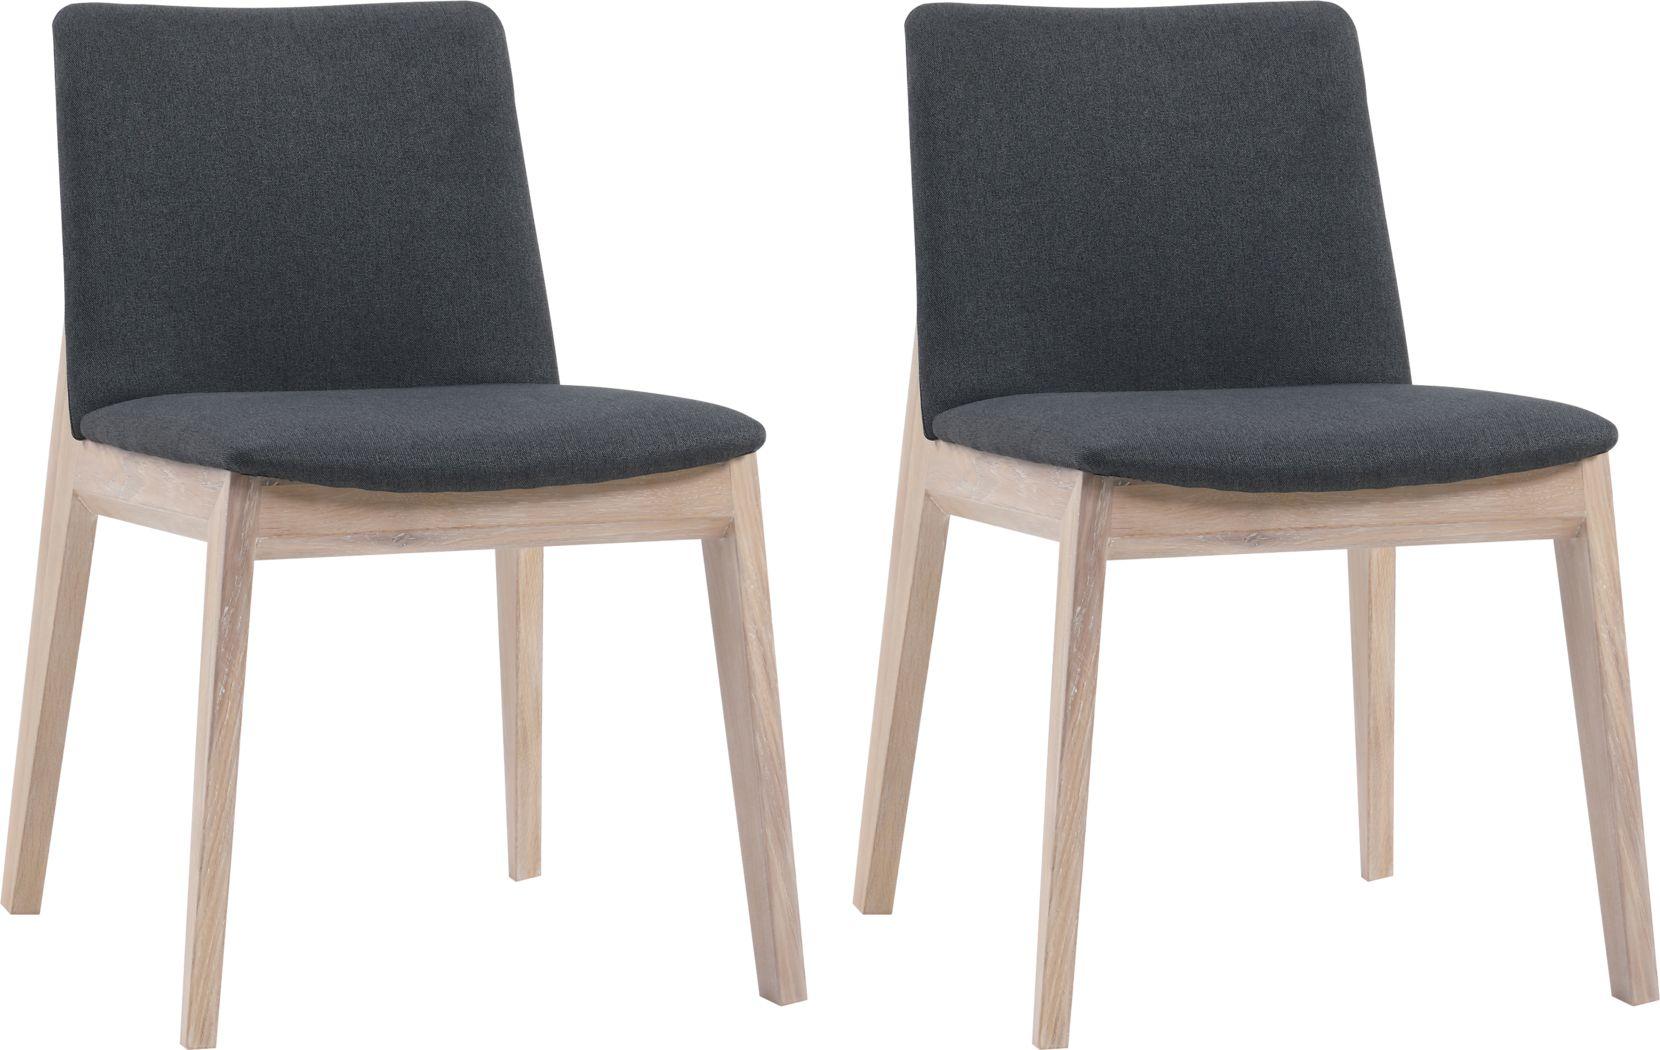 Bayard Way Charcoal Dining Chair, Set of 2